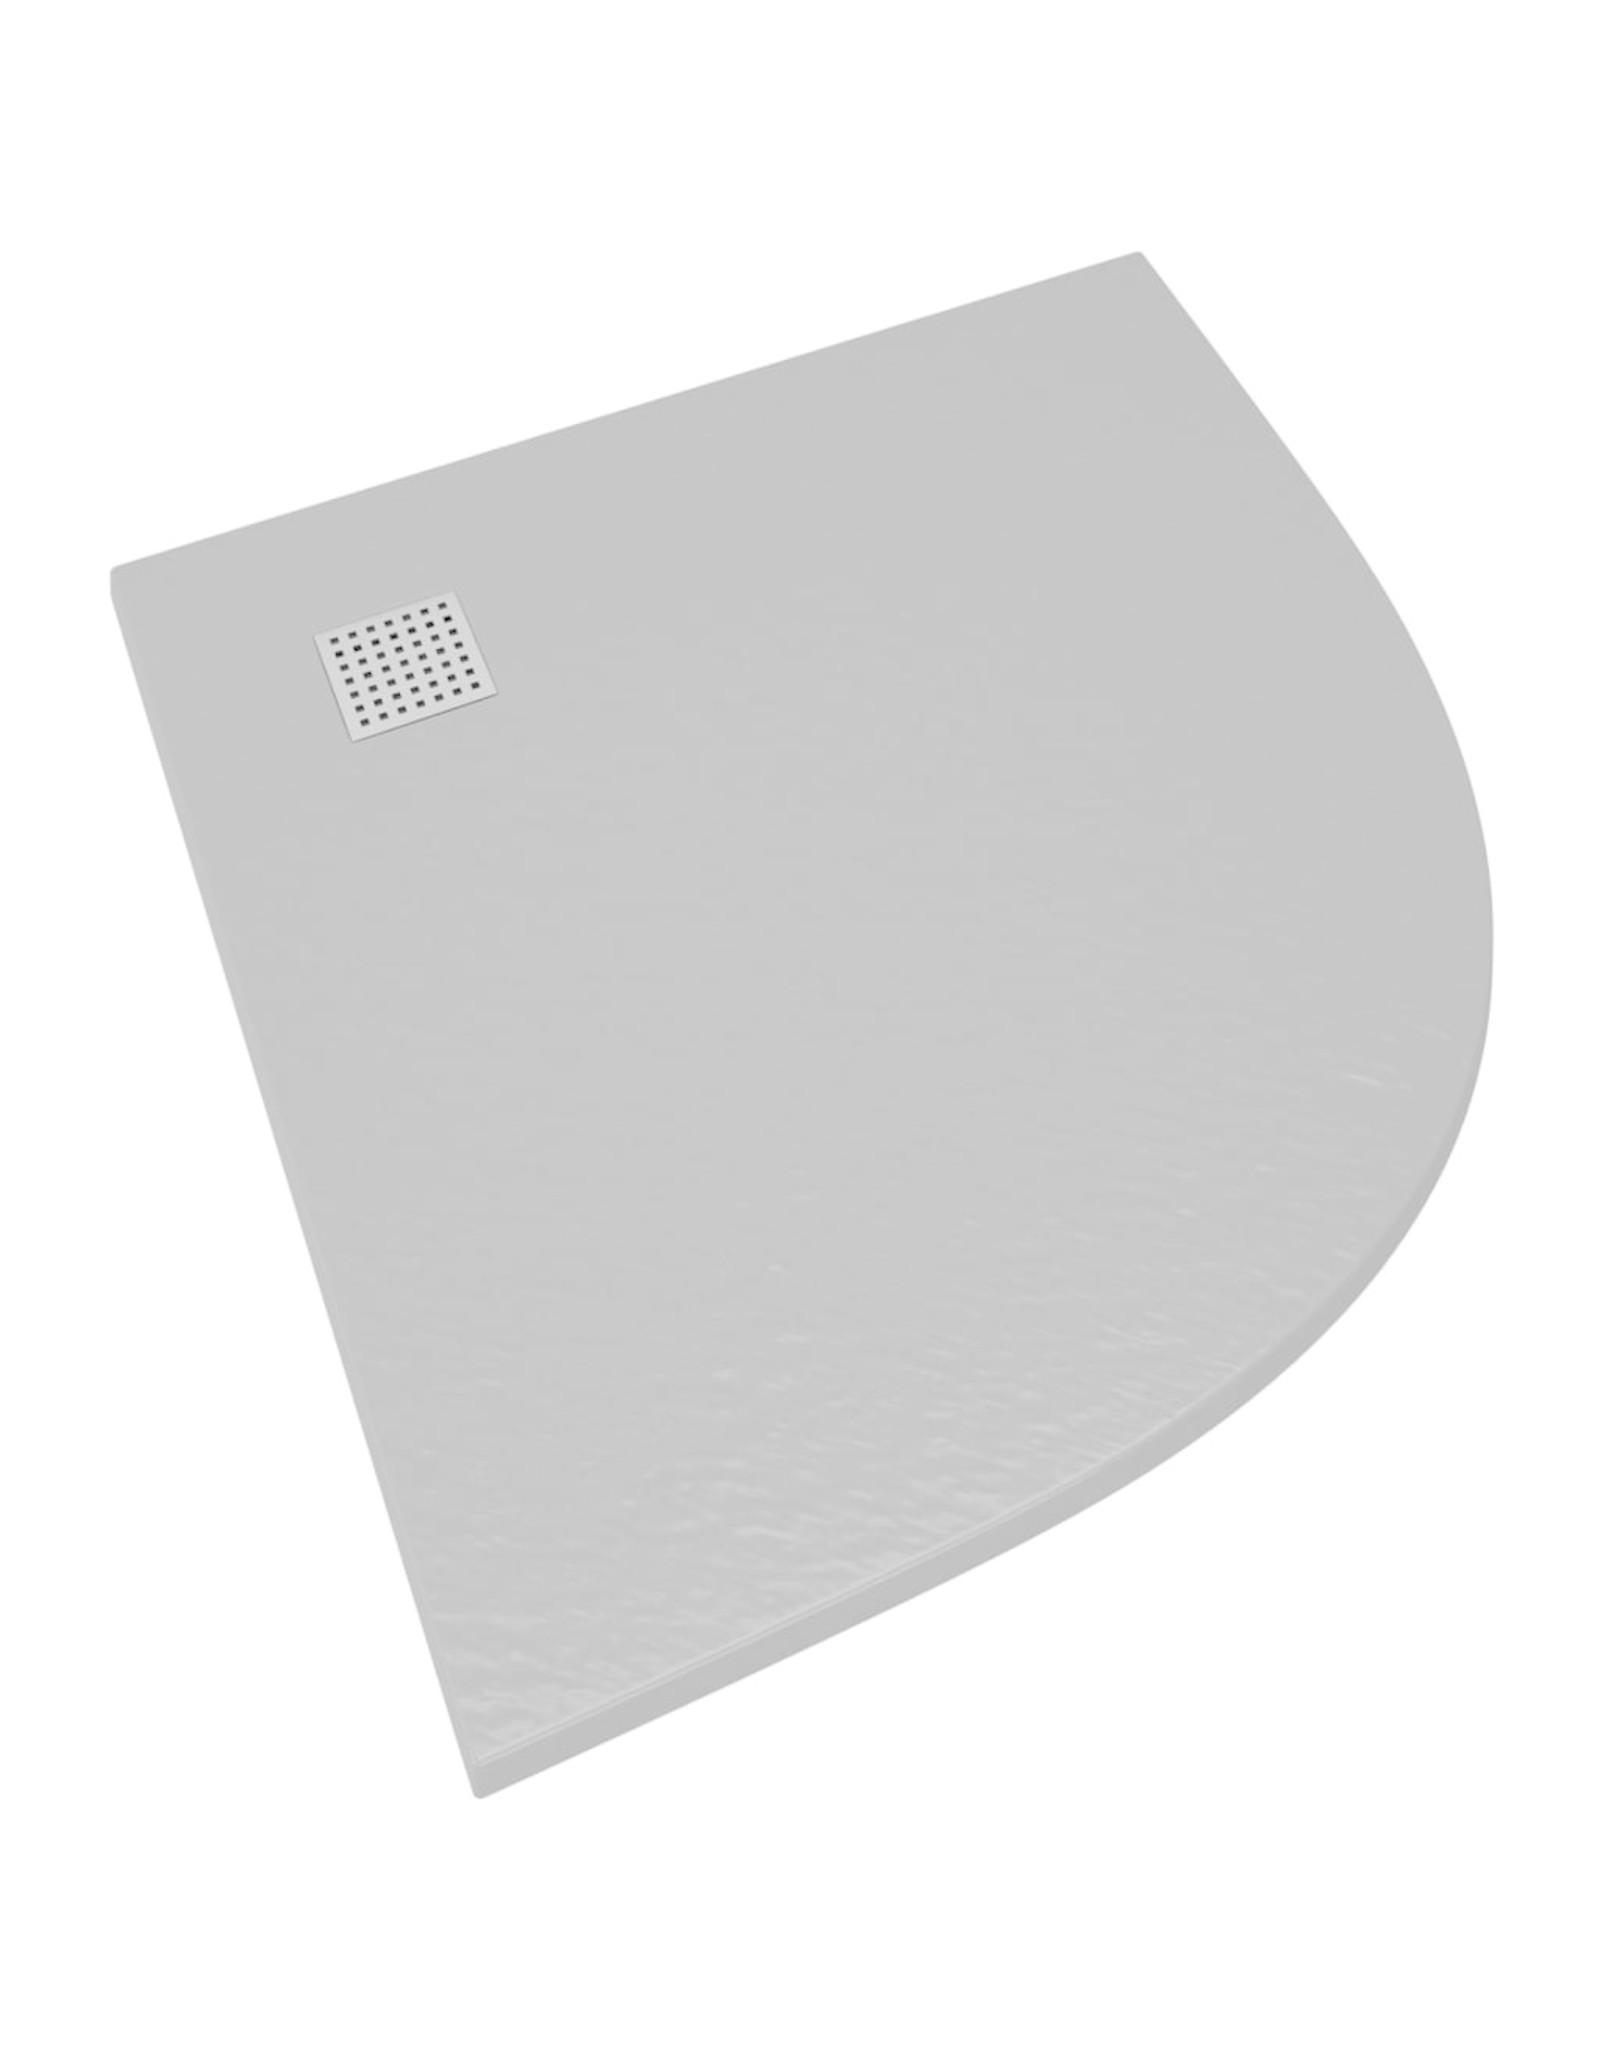 Douchebak 90x90 cm SMC grijs